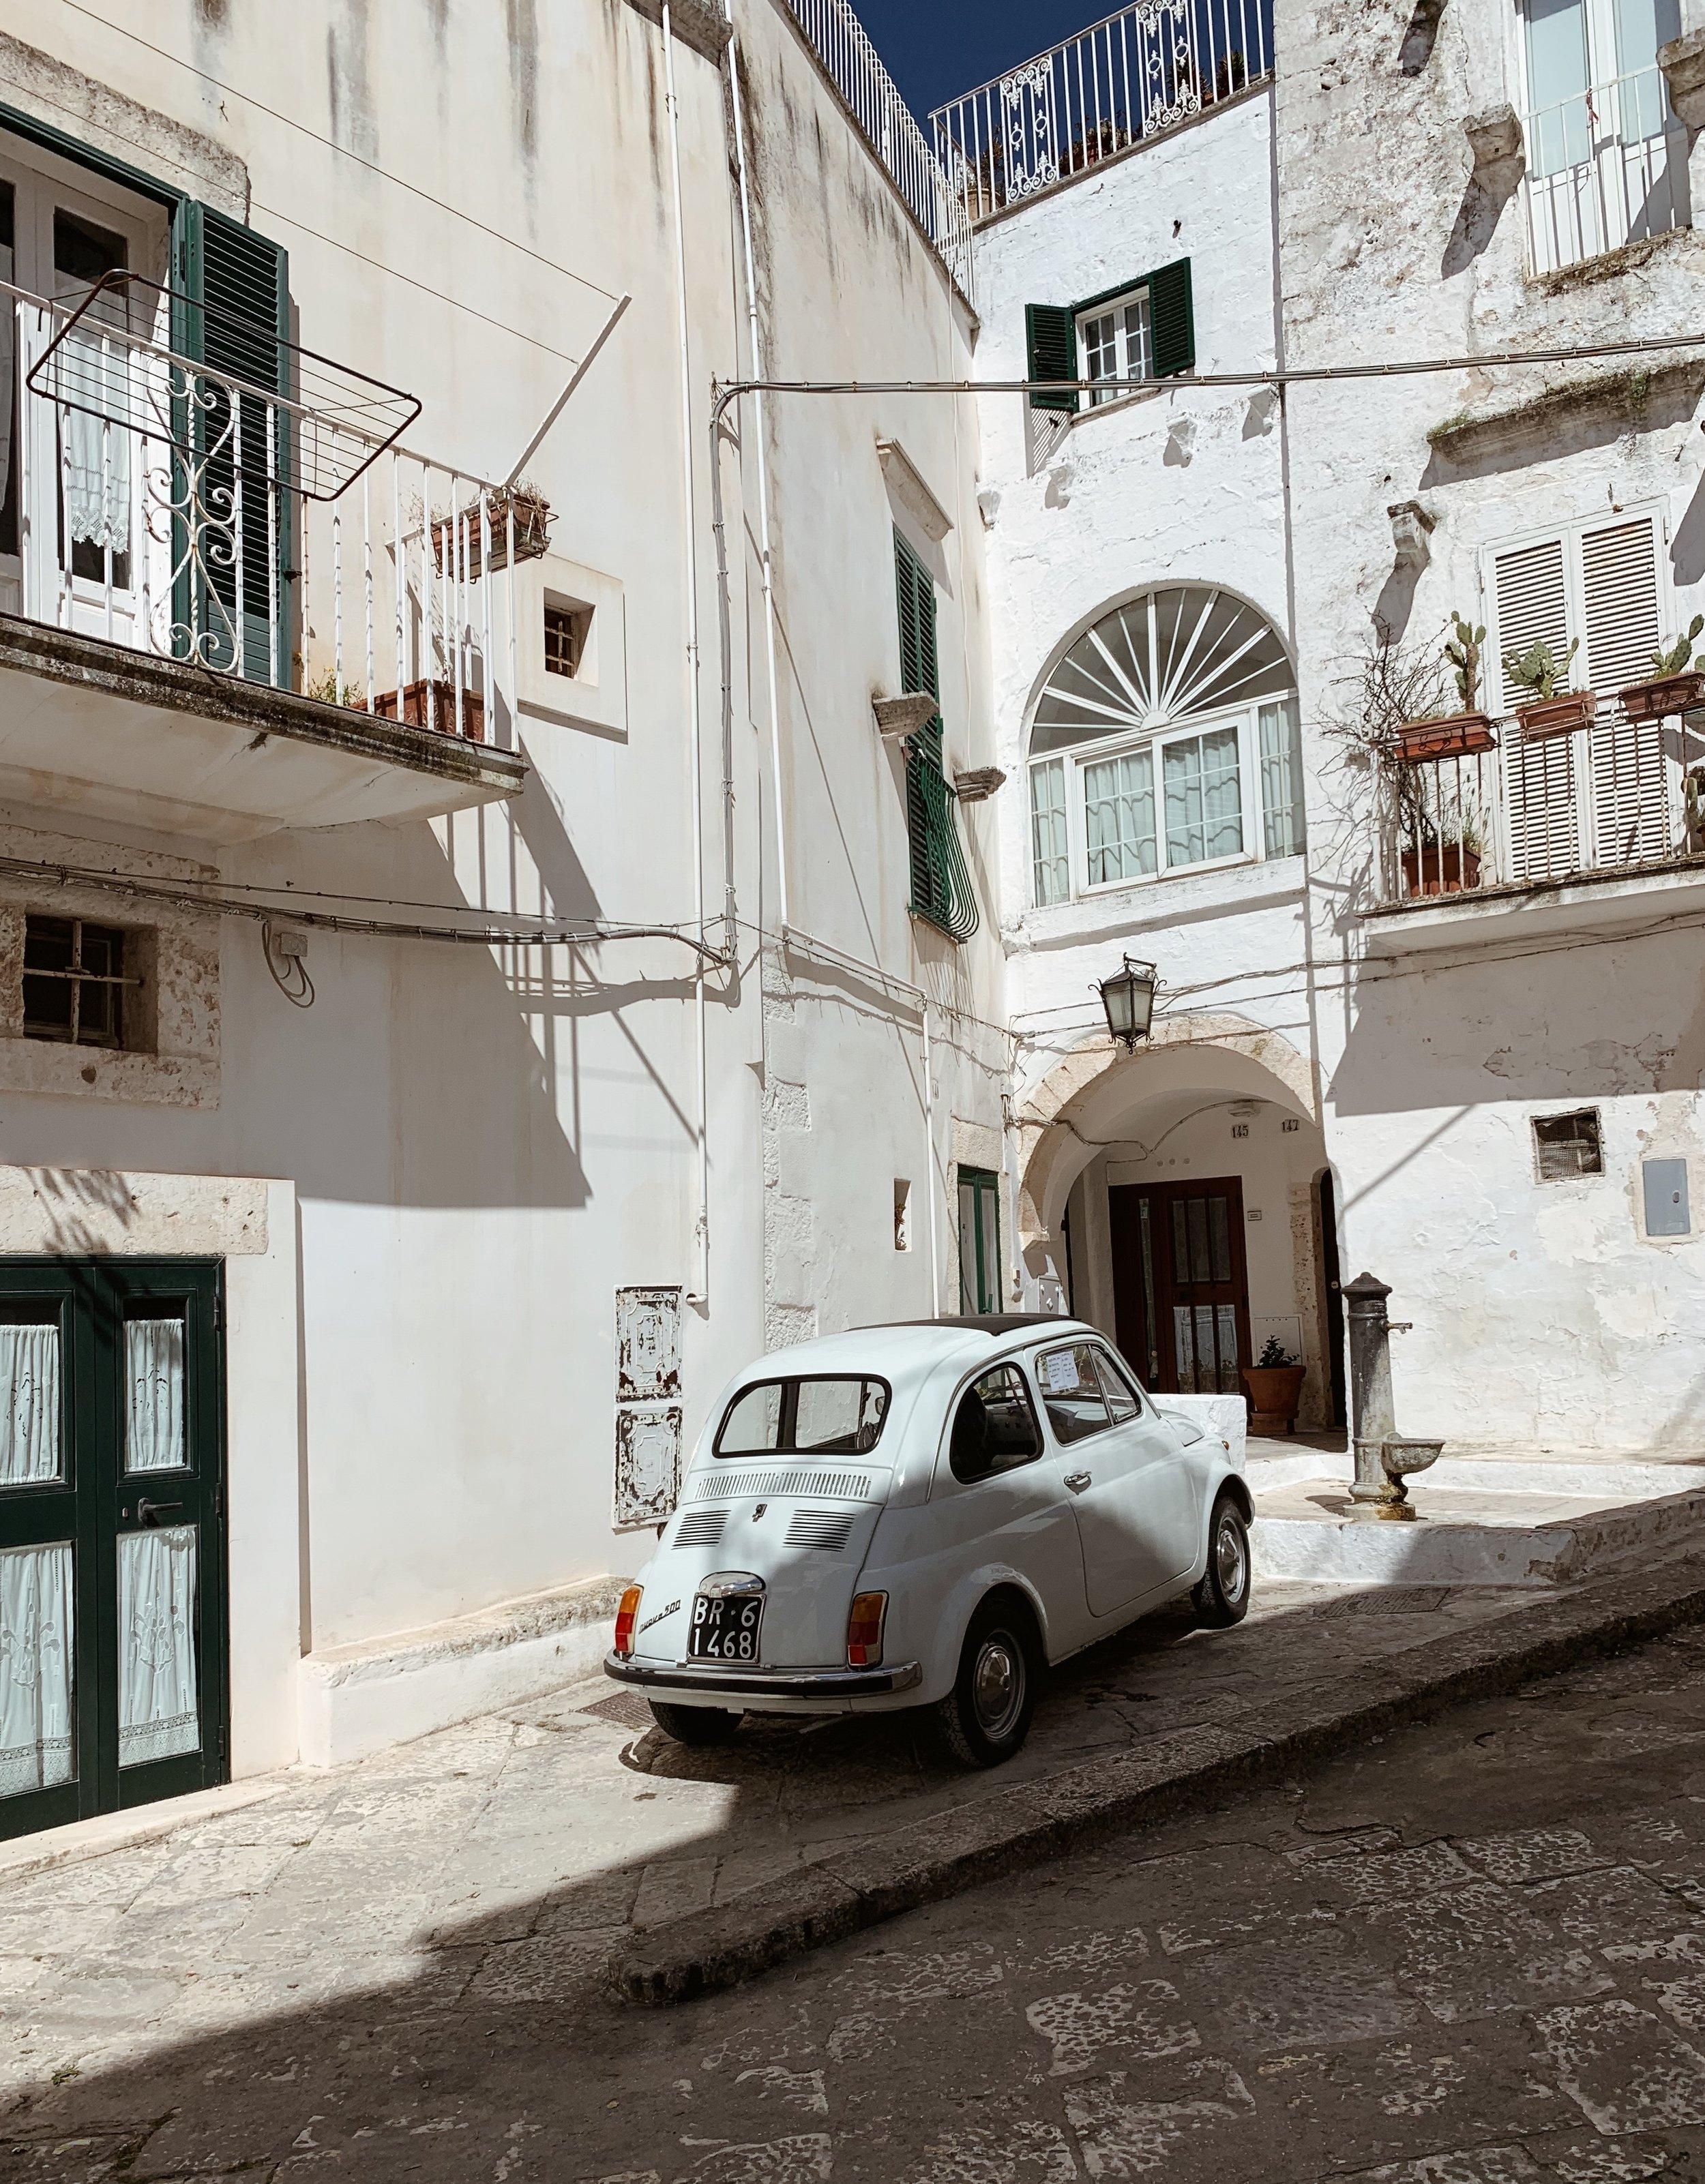 GinaGoesTo_Puglia 6.JPG